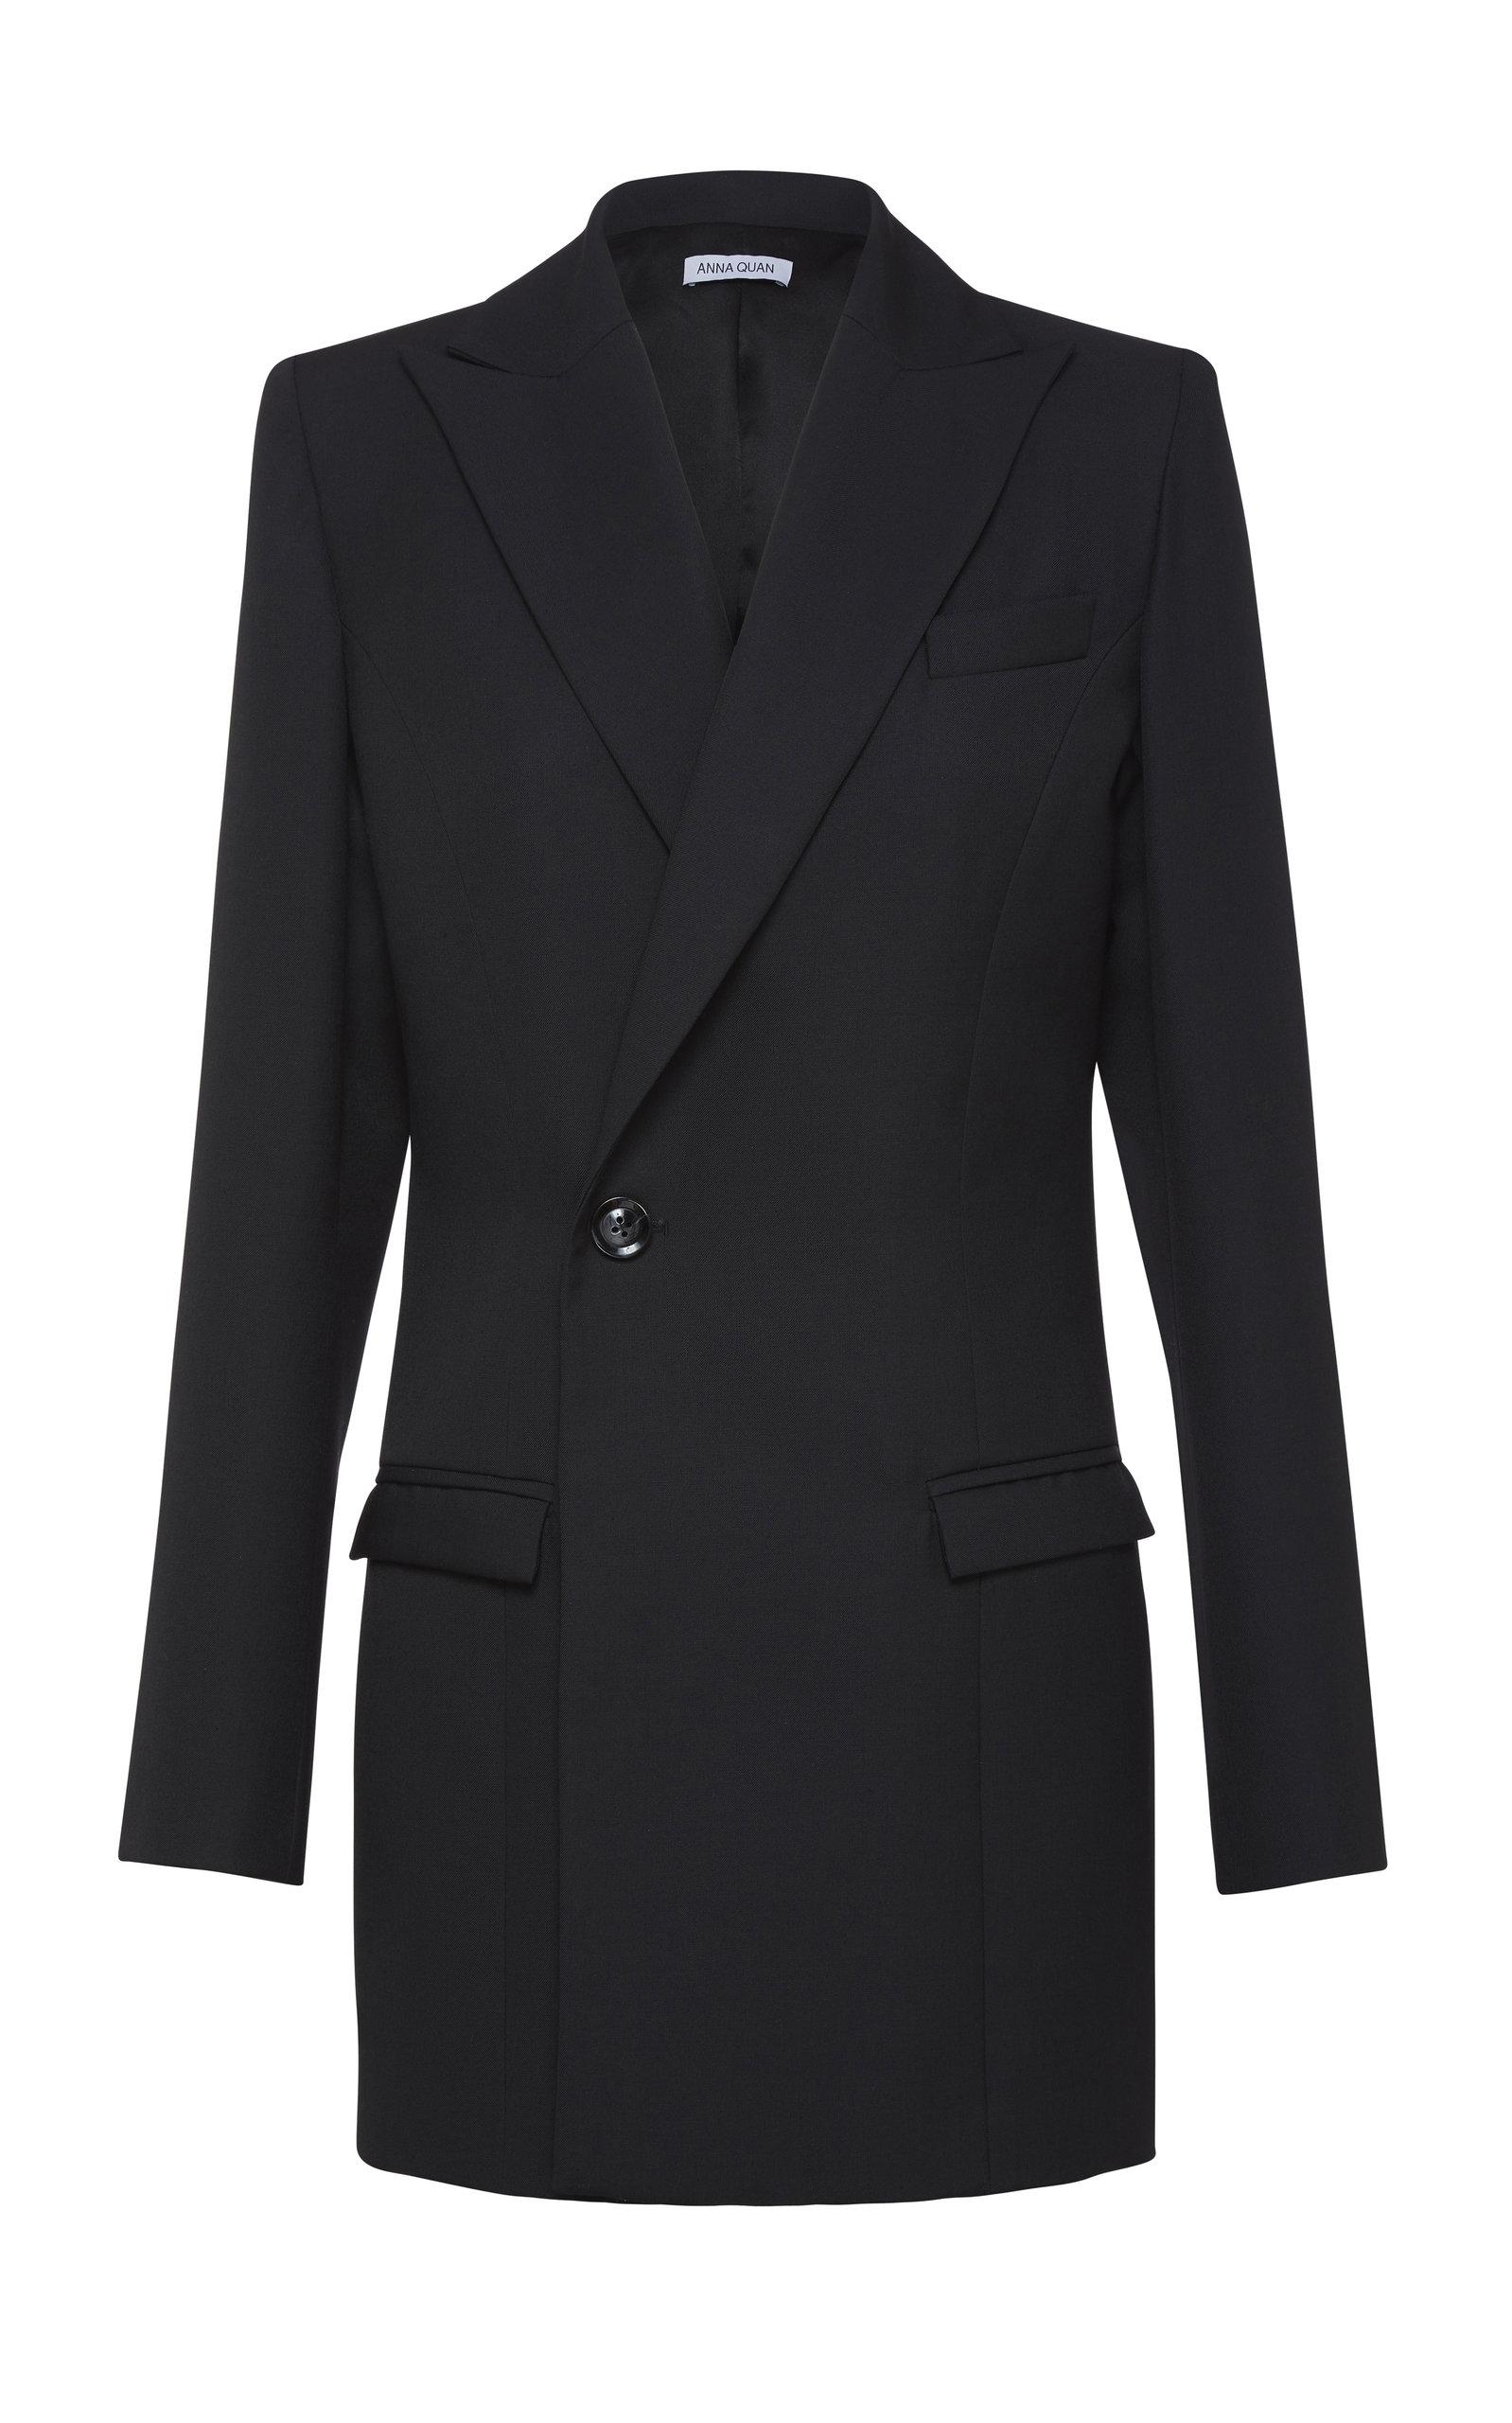 ANNA QUAN Sienna Jacket in Black